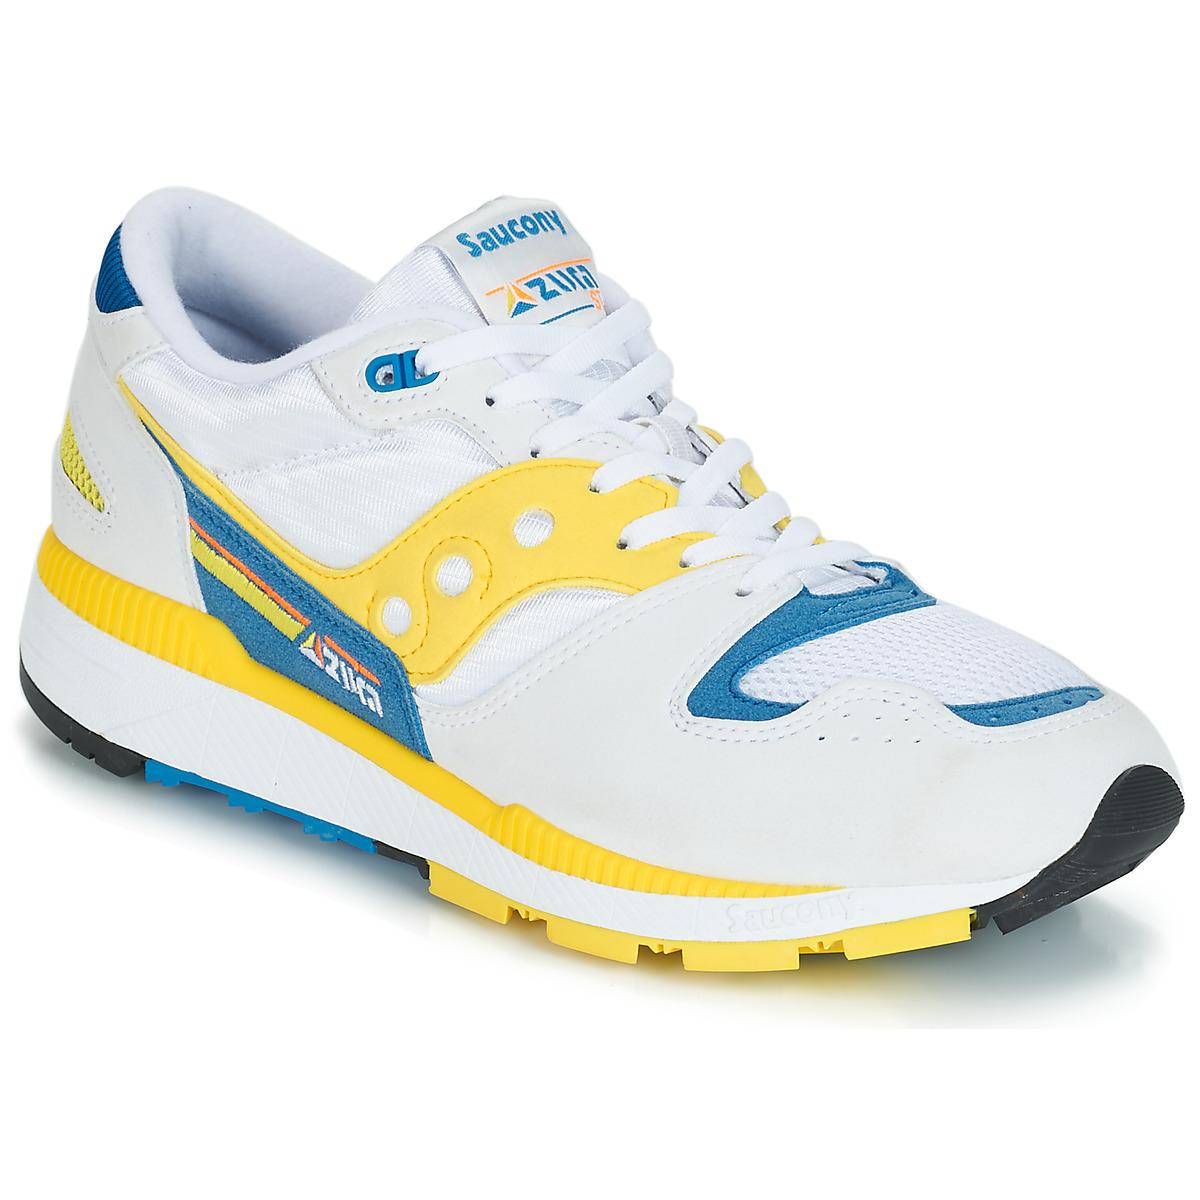 saucony shoes outlet